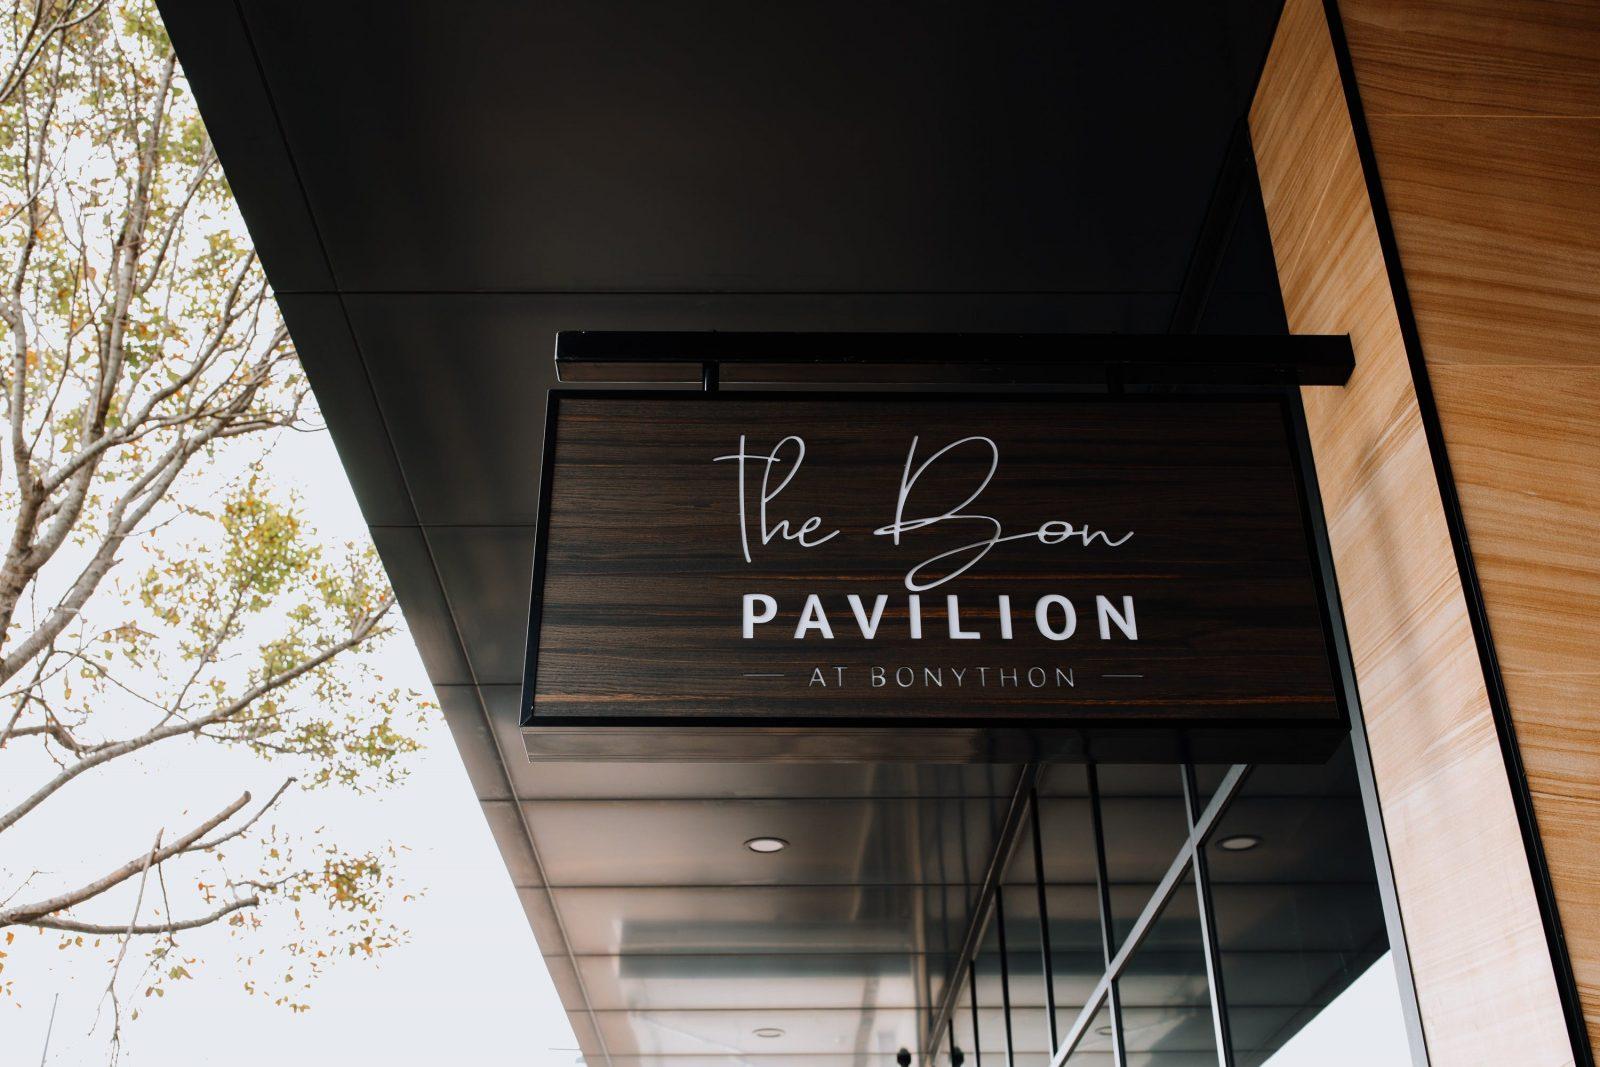 Food and beverages at The Bon Pavilion